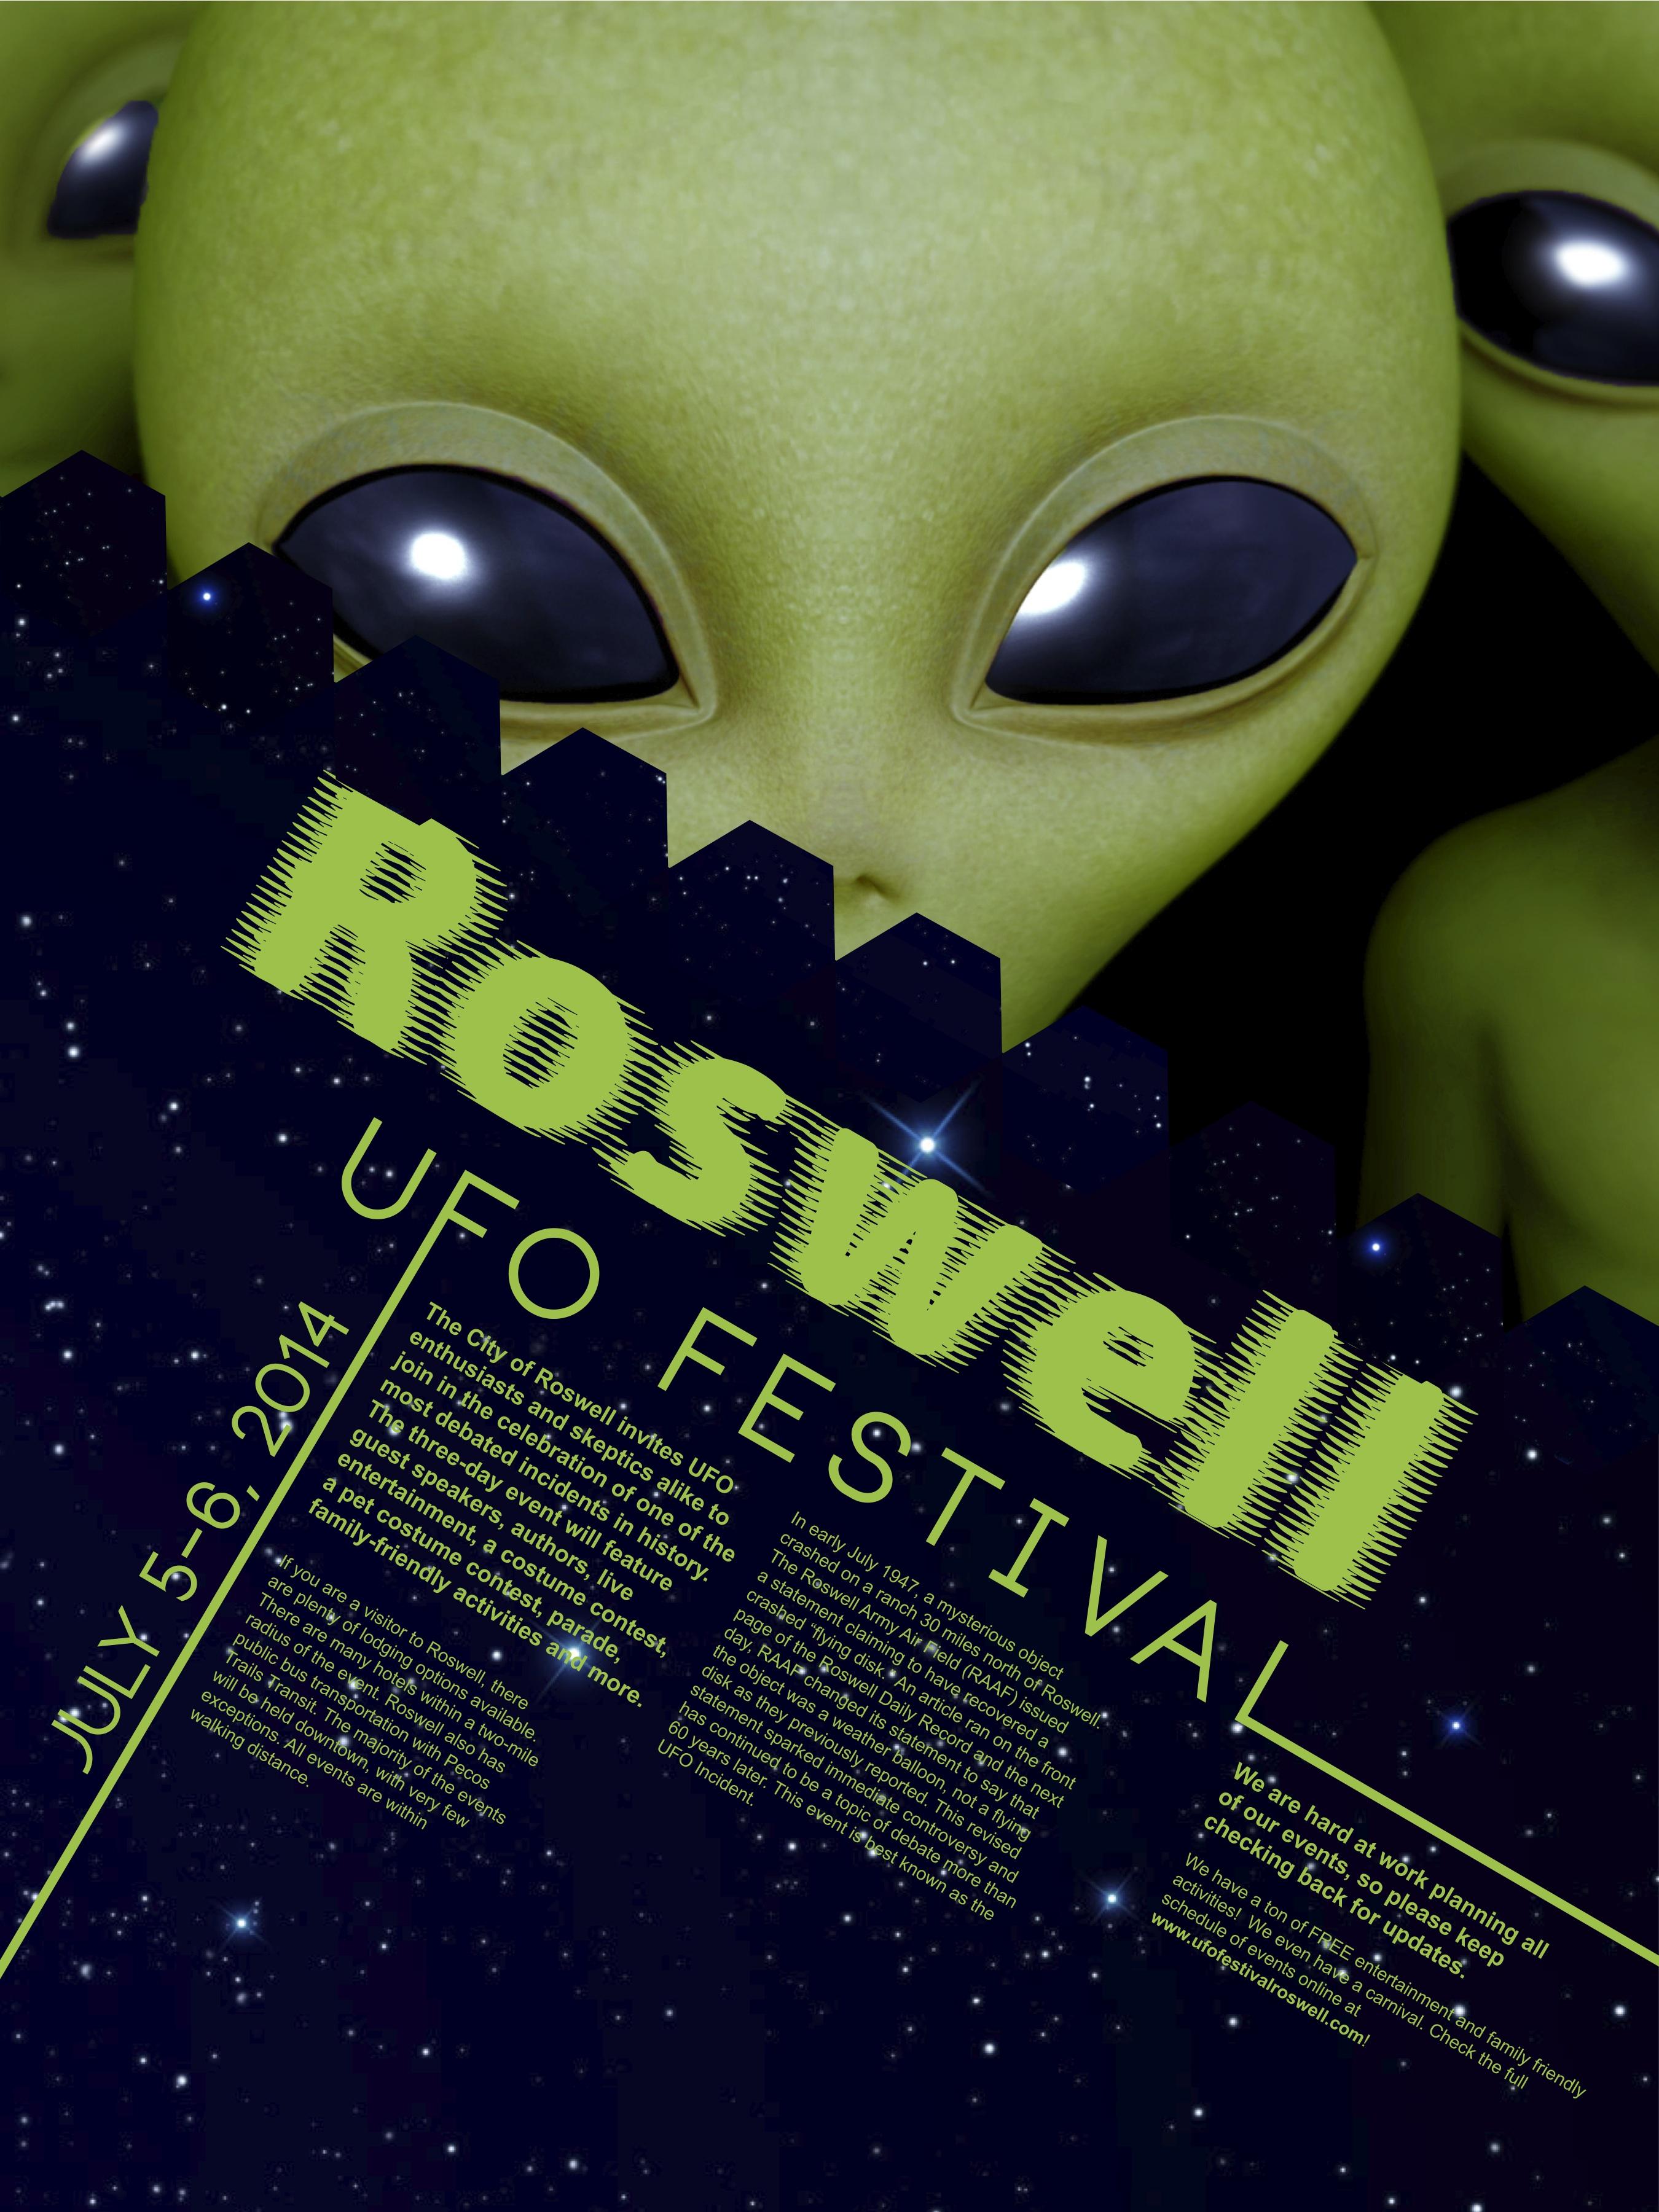 roswellNEW